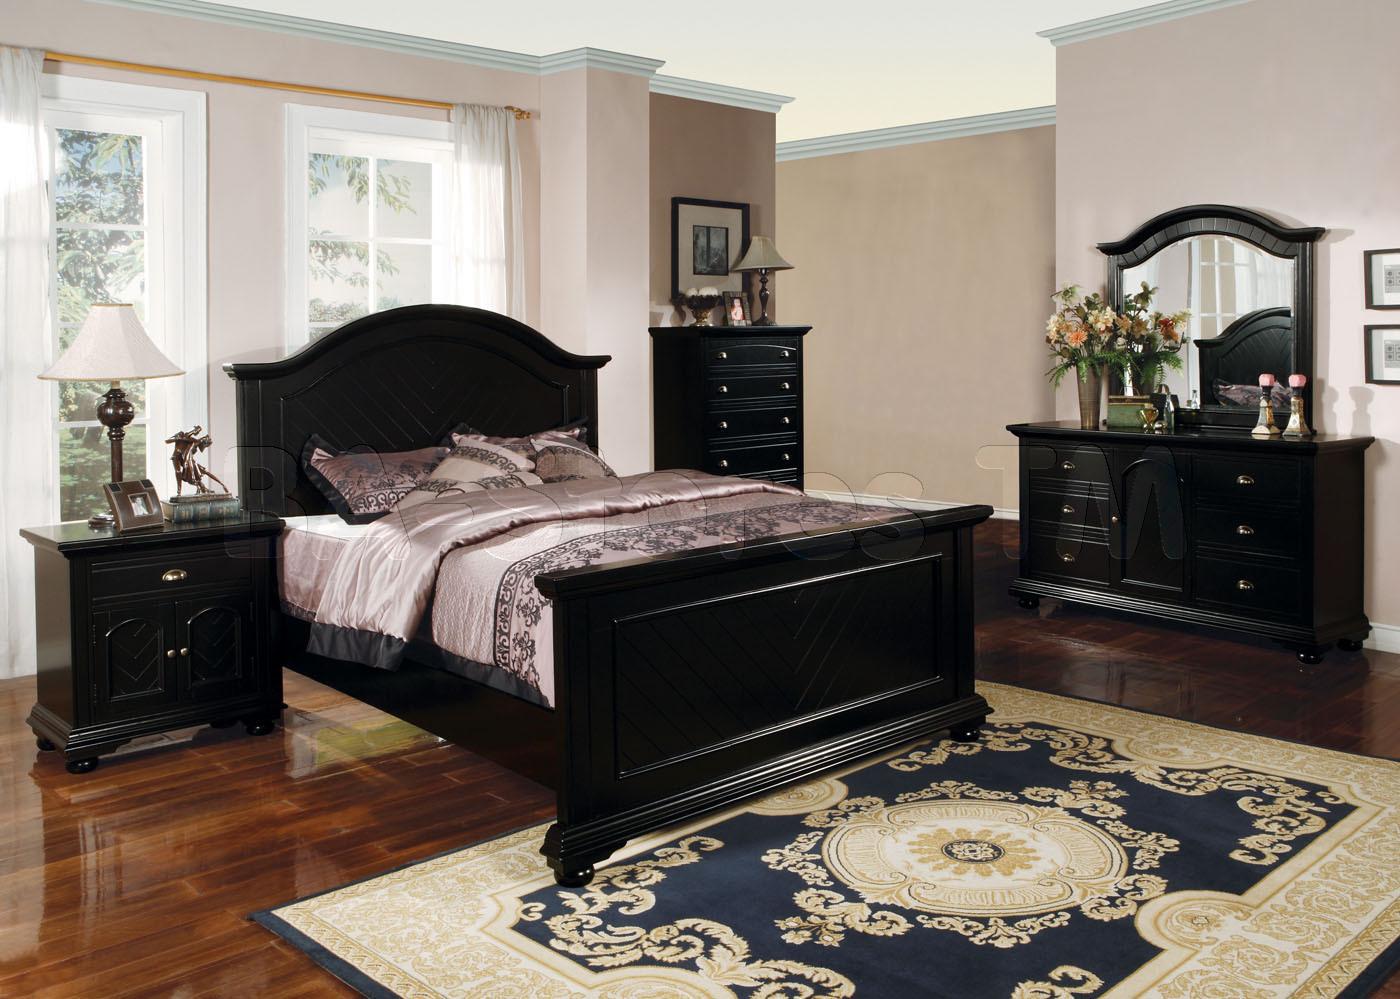 retro bedroom furniture ideas photo - 4